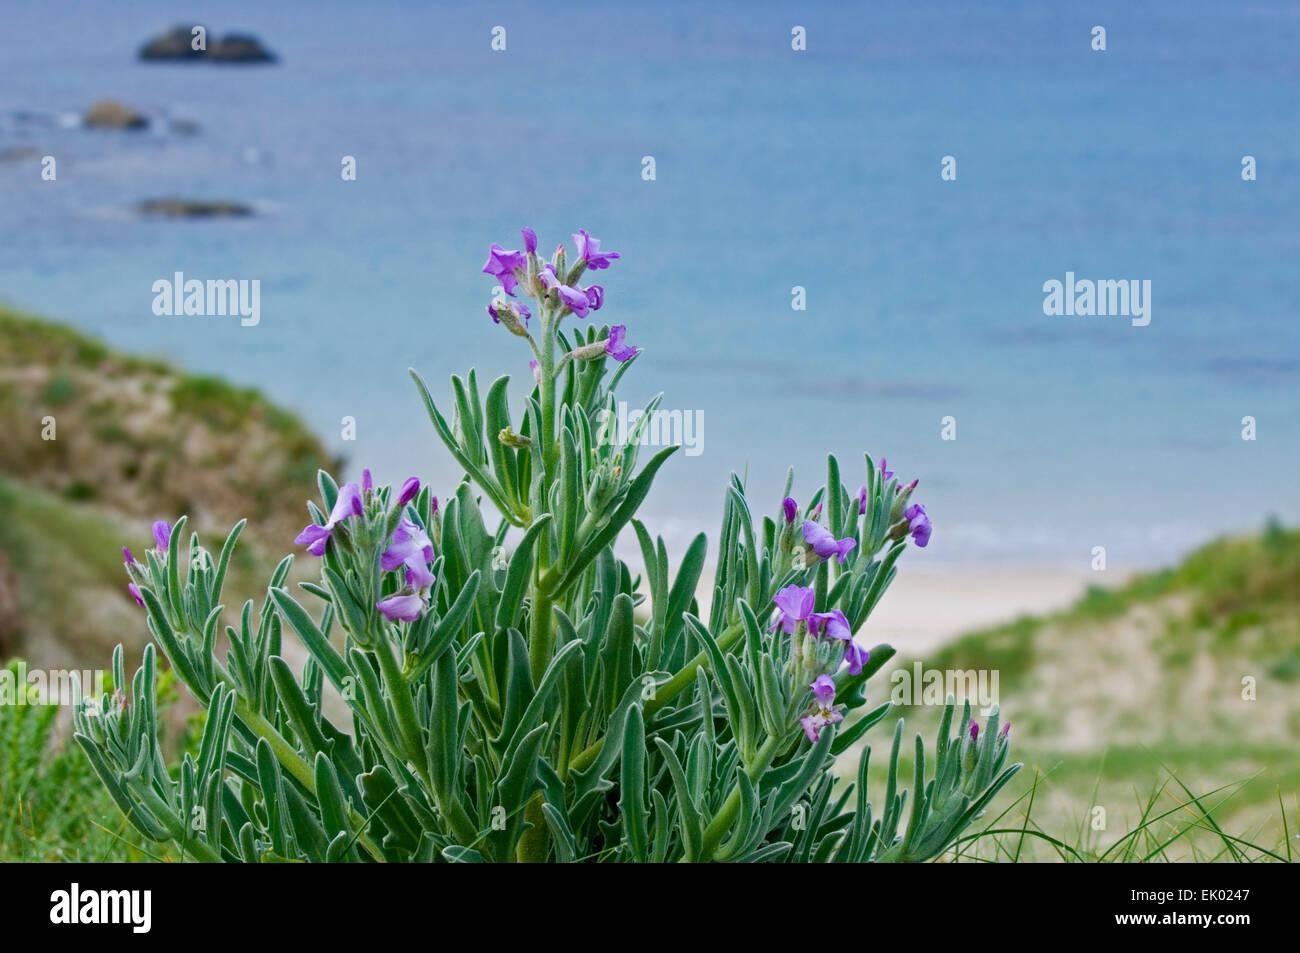 Sea stock (Matthiola sinuata / Cheiranthus muricatus) in flower in the dunes along the coast - Stock Image